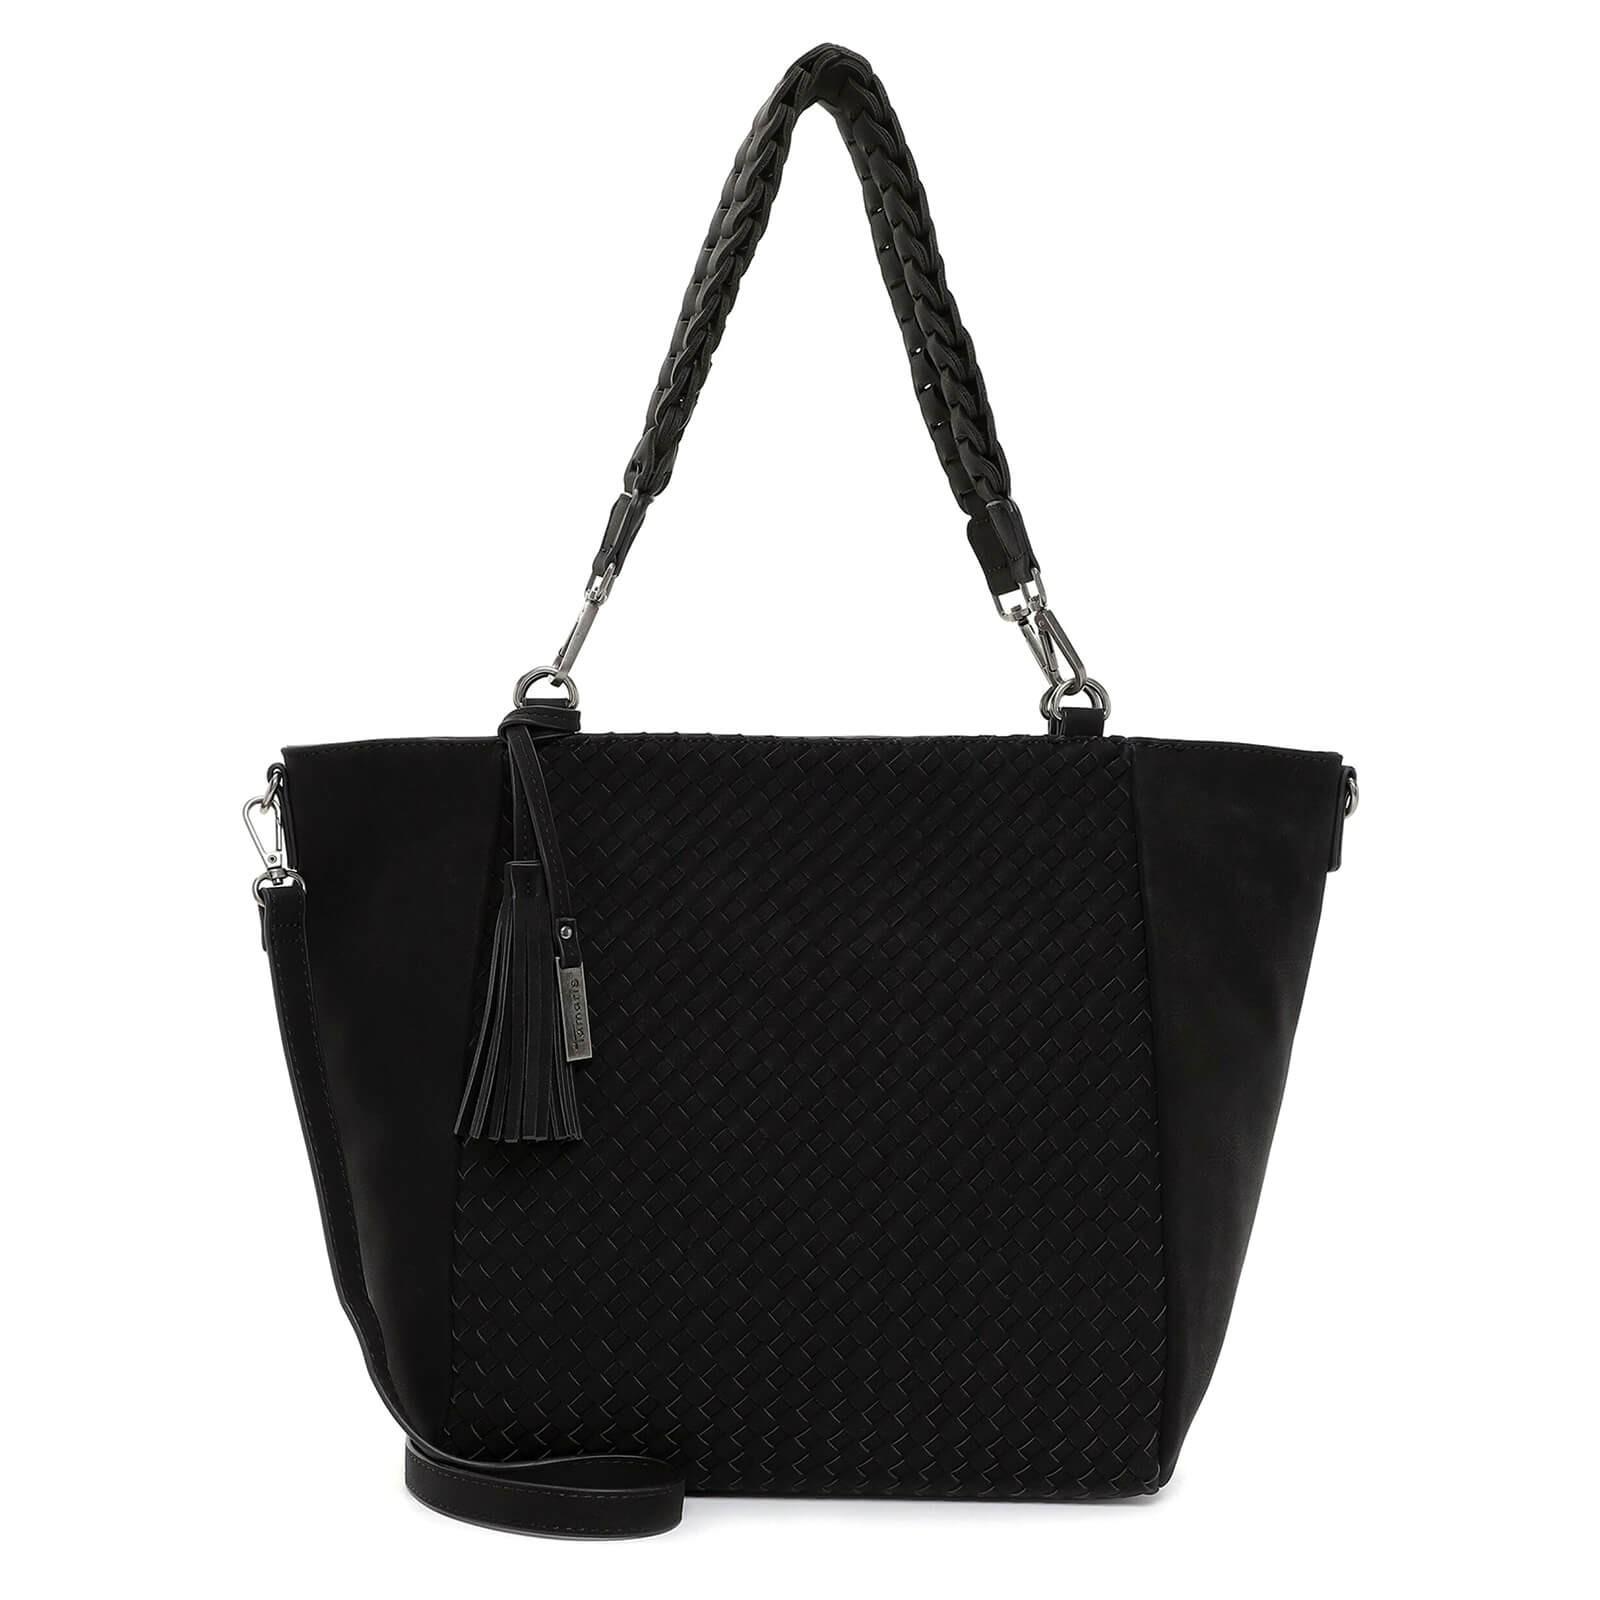 Dámska kabelka Tamaris Divie - čierna